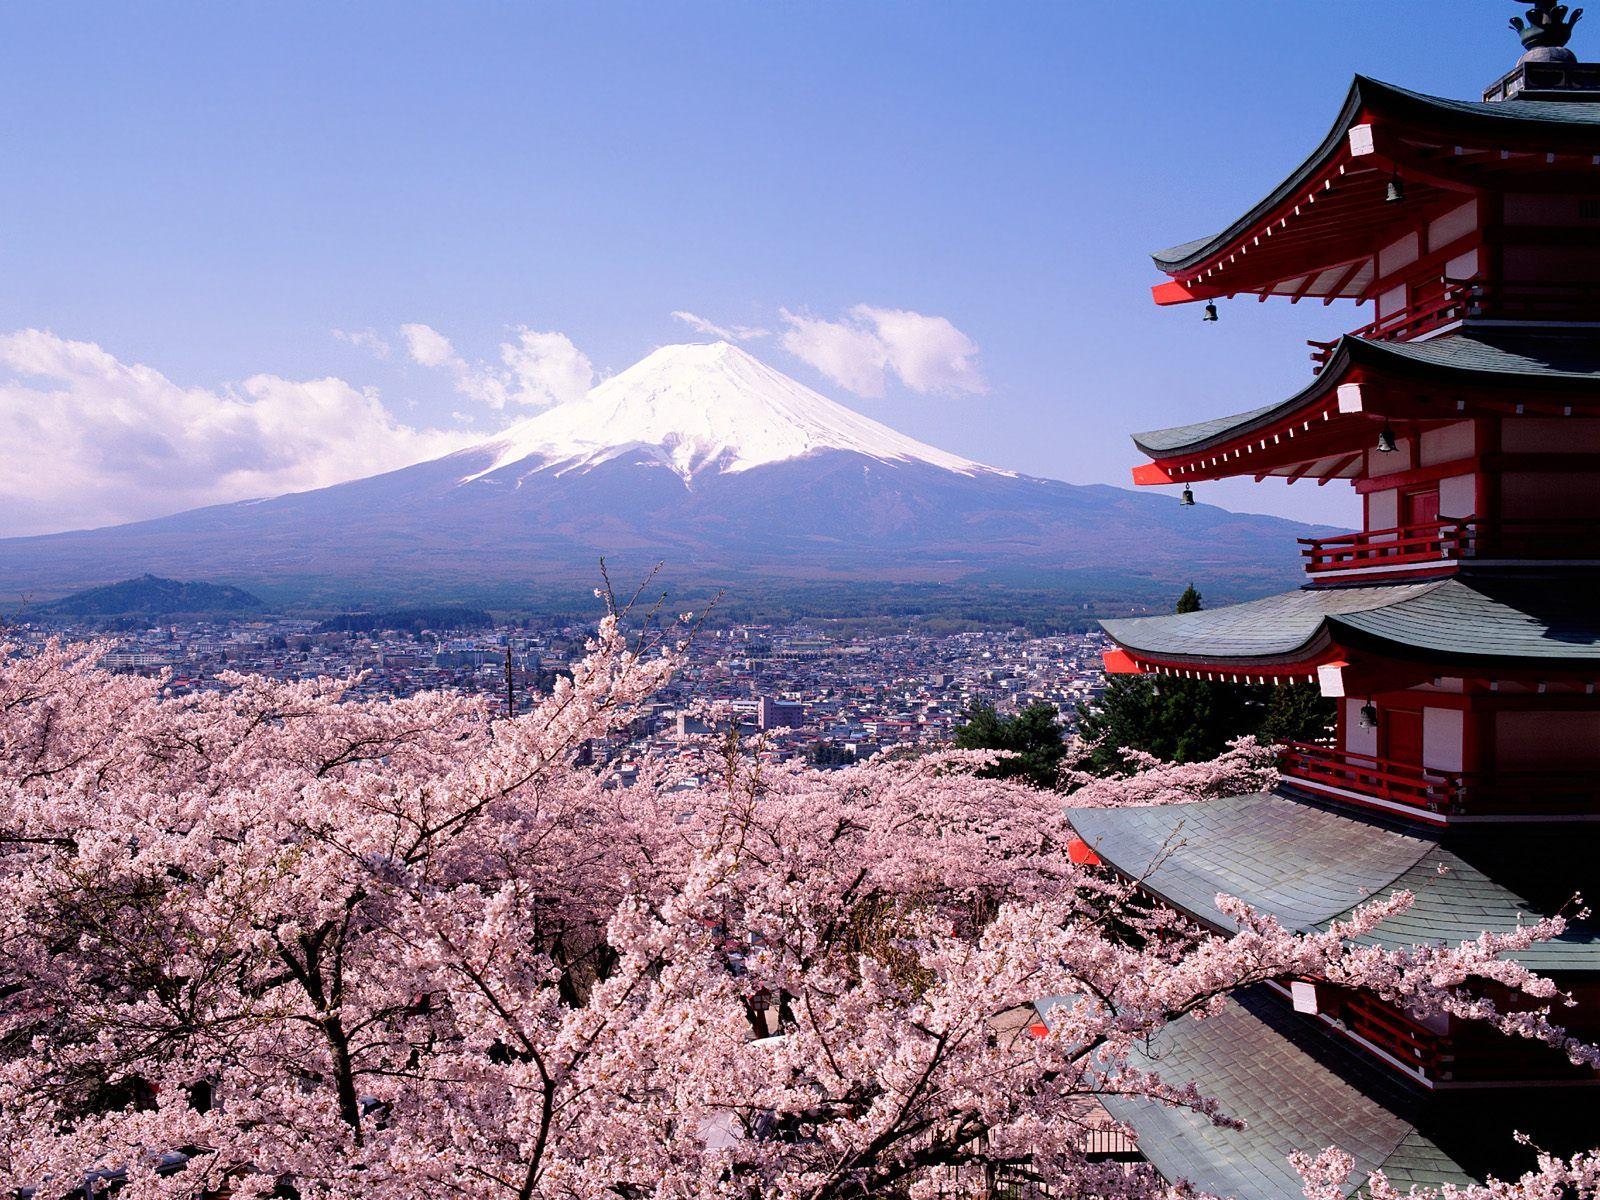 Japan Wallpapers   Top Japan Backgrounds   WallpaperAccess 1600x1200